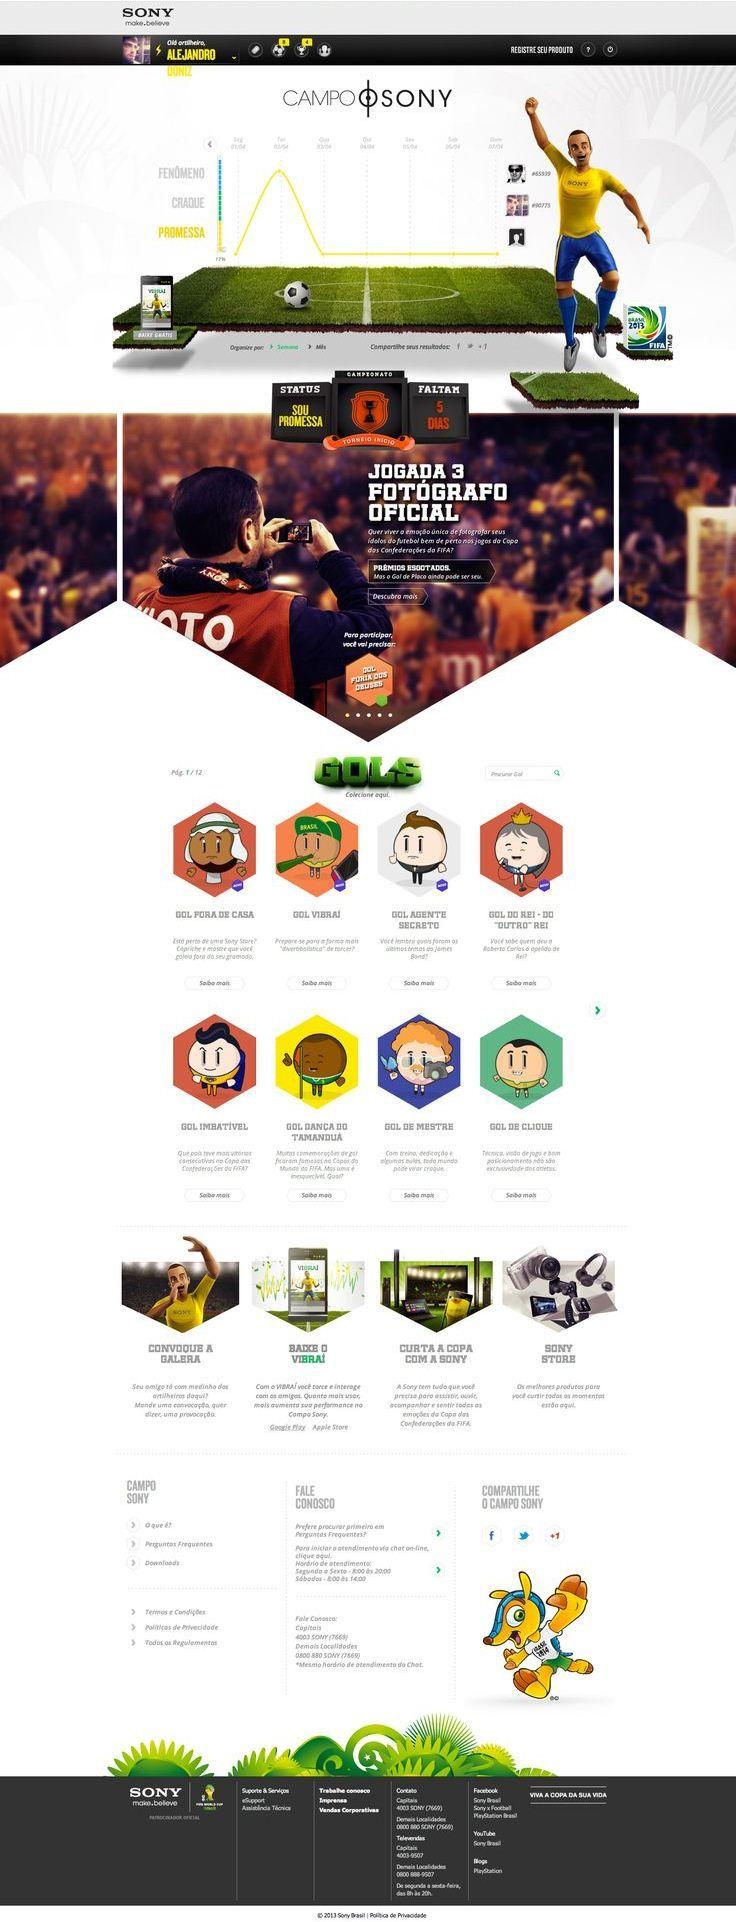 Unique Web Design, Campo Sony #WebDesign #Design (http://www.pinterest.com/aldenchong/)